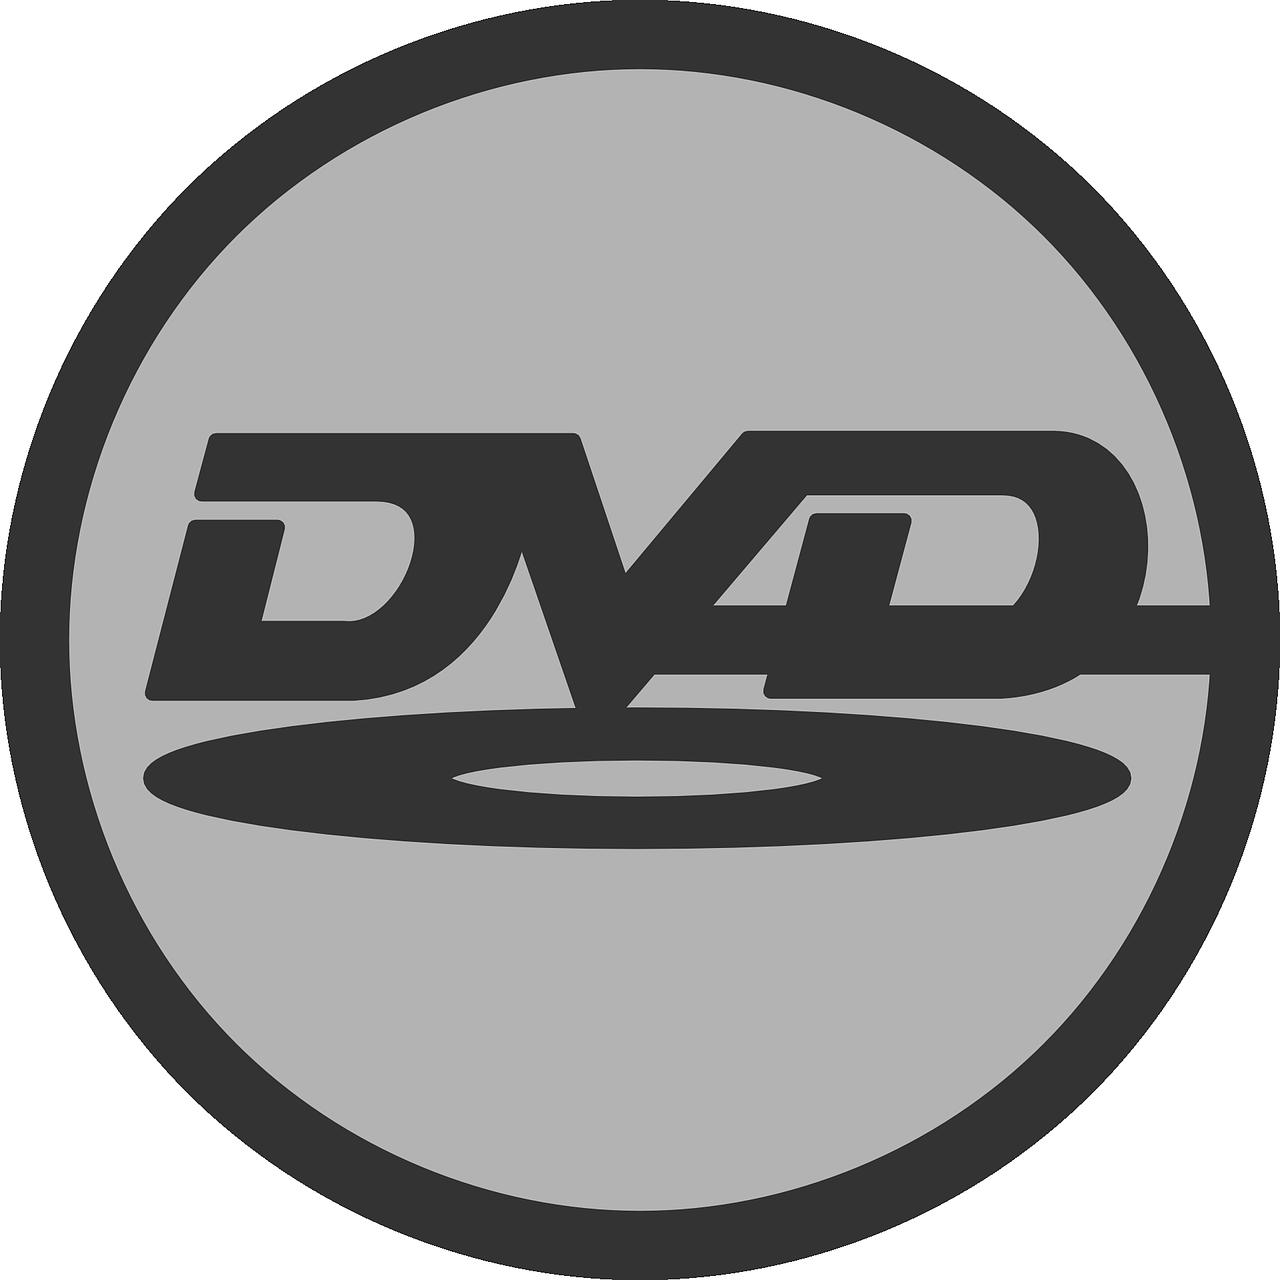 dvd-27792_1280